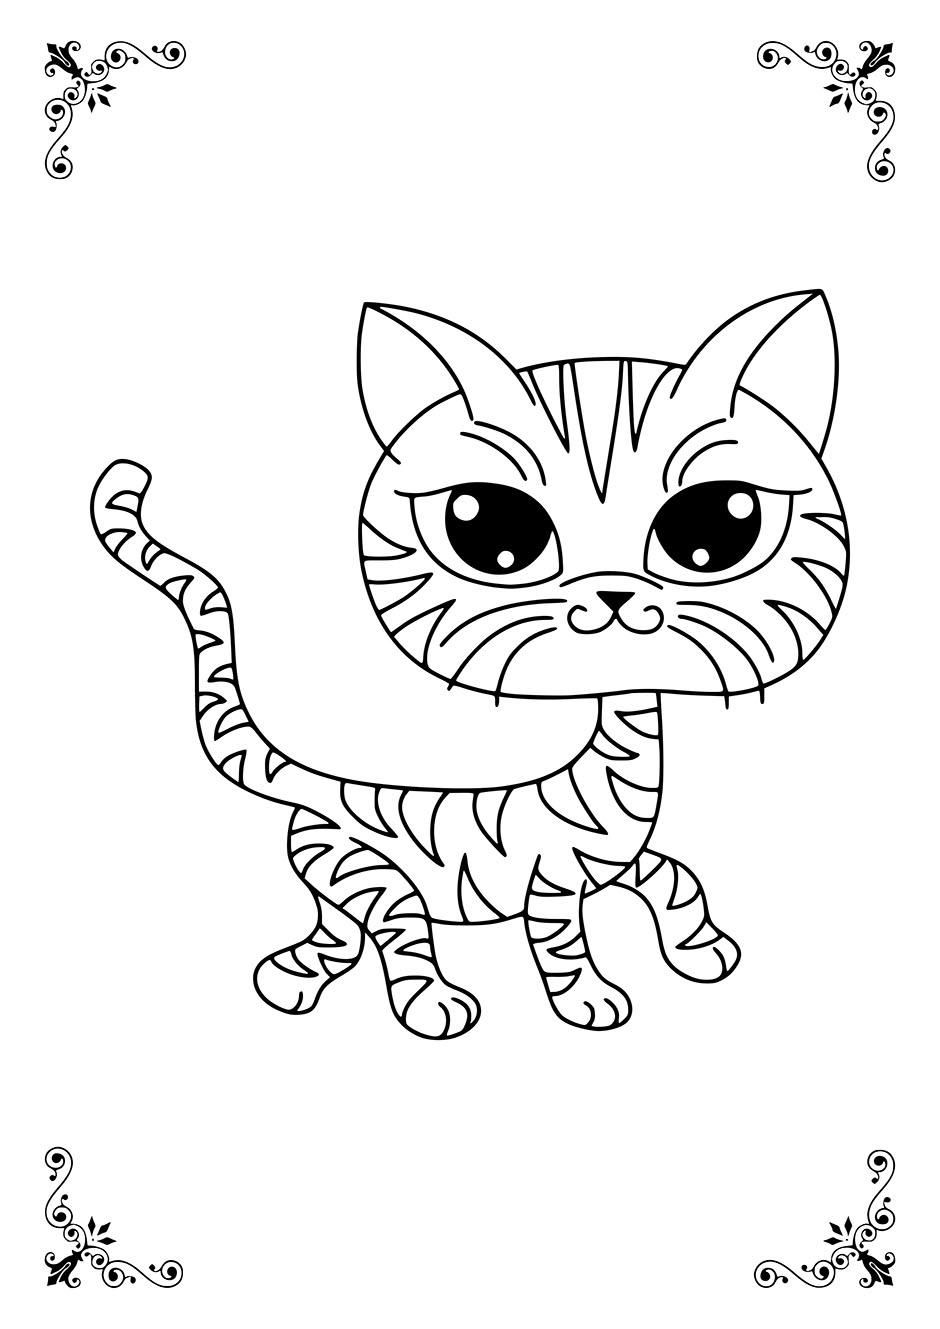 Раскраска: смешная кошка — raskraski-a4.ru